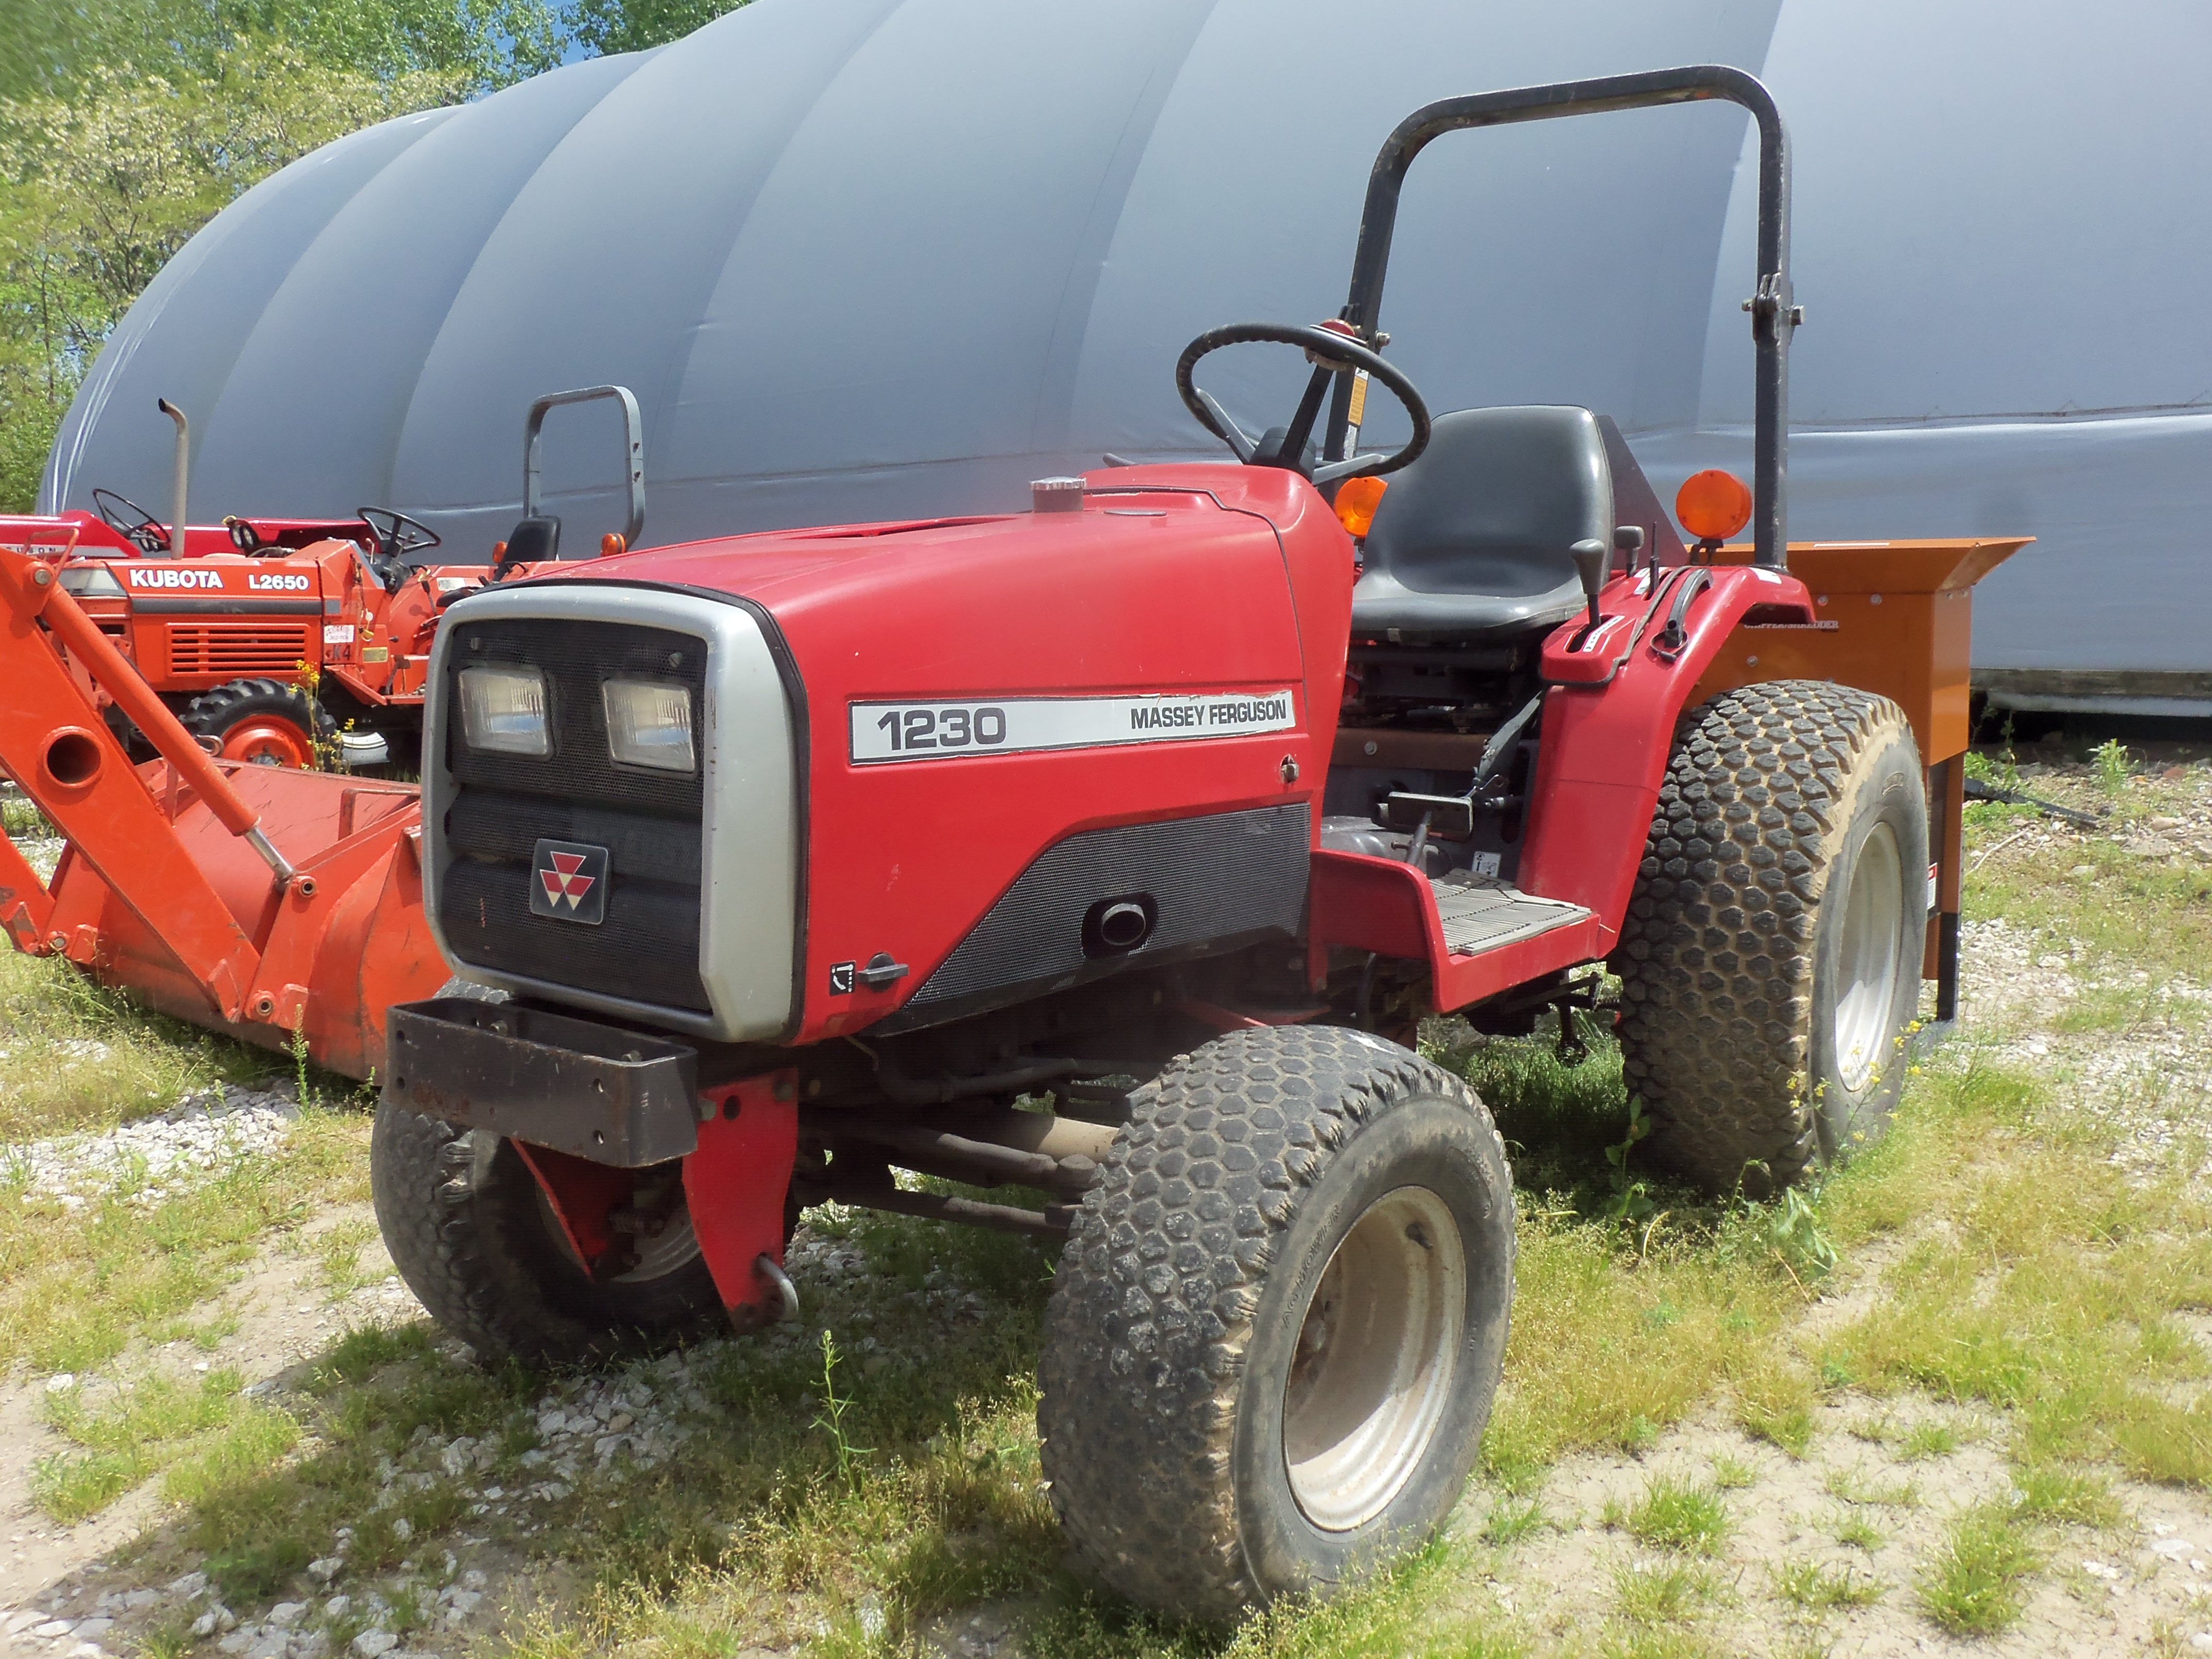 Massey Ferguson 1230 compact diesel tractor | Massey Ferguson ...